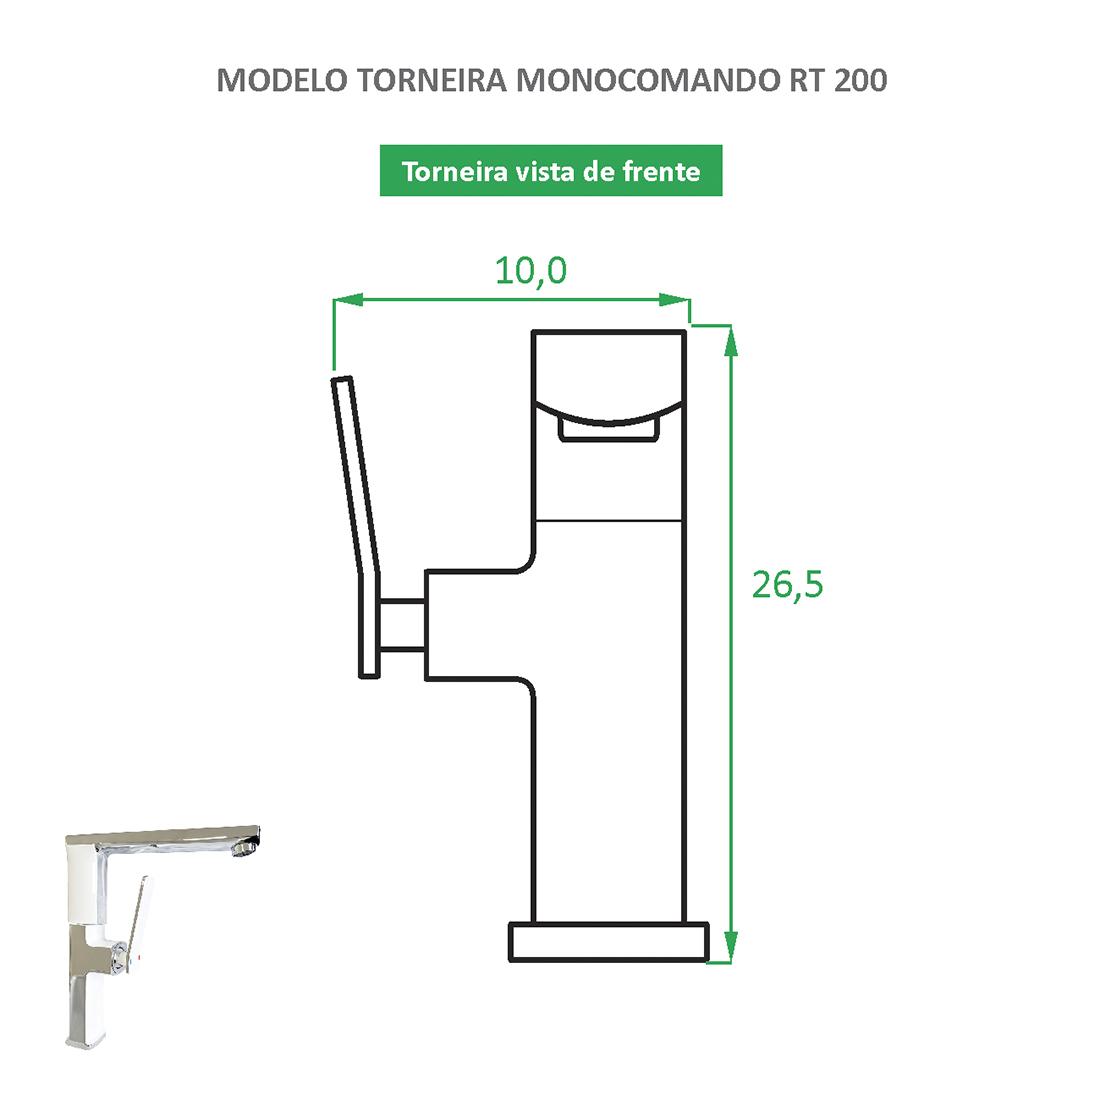 Torneira Monocomando bica alta RT 200